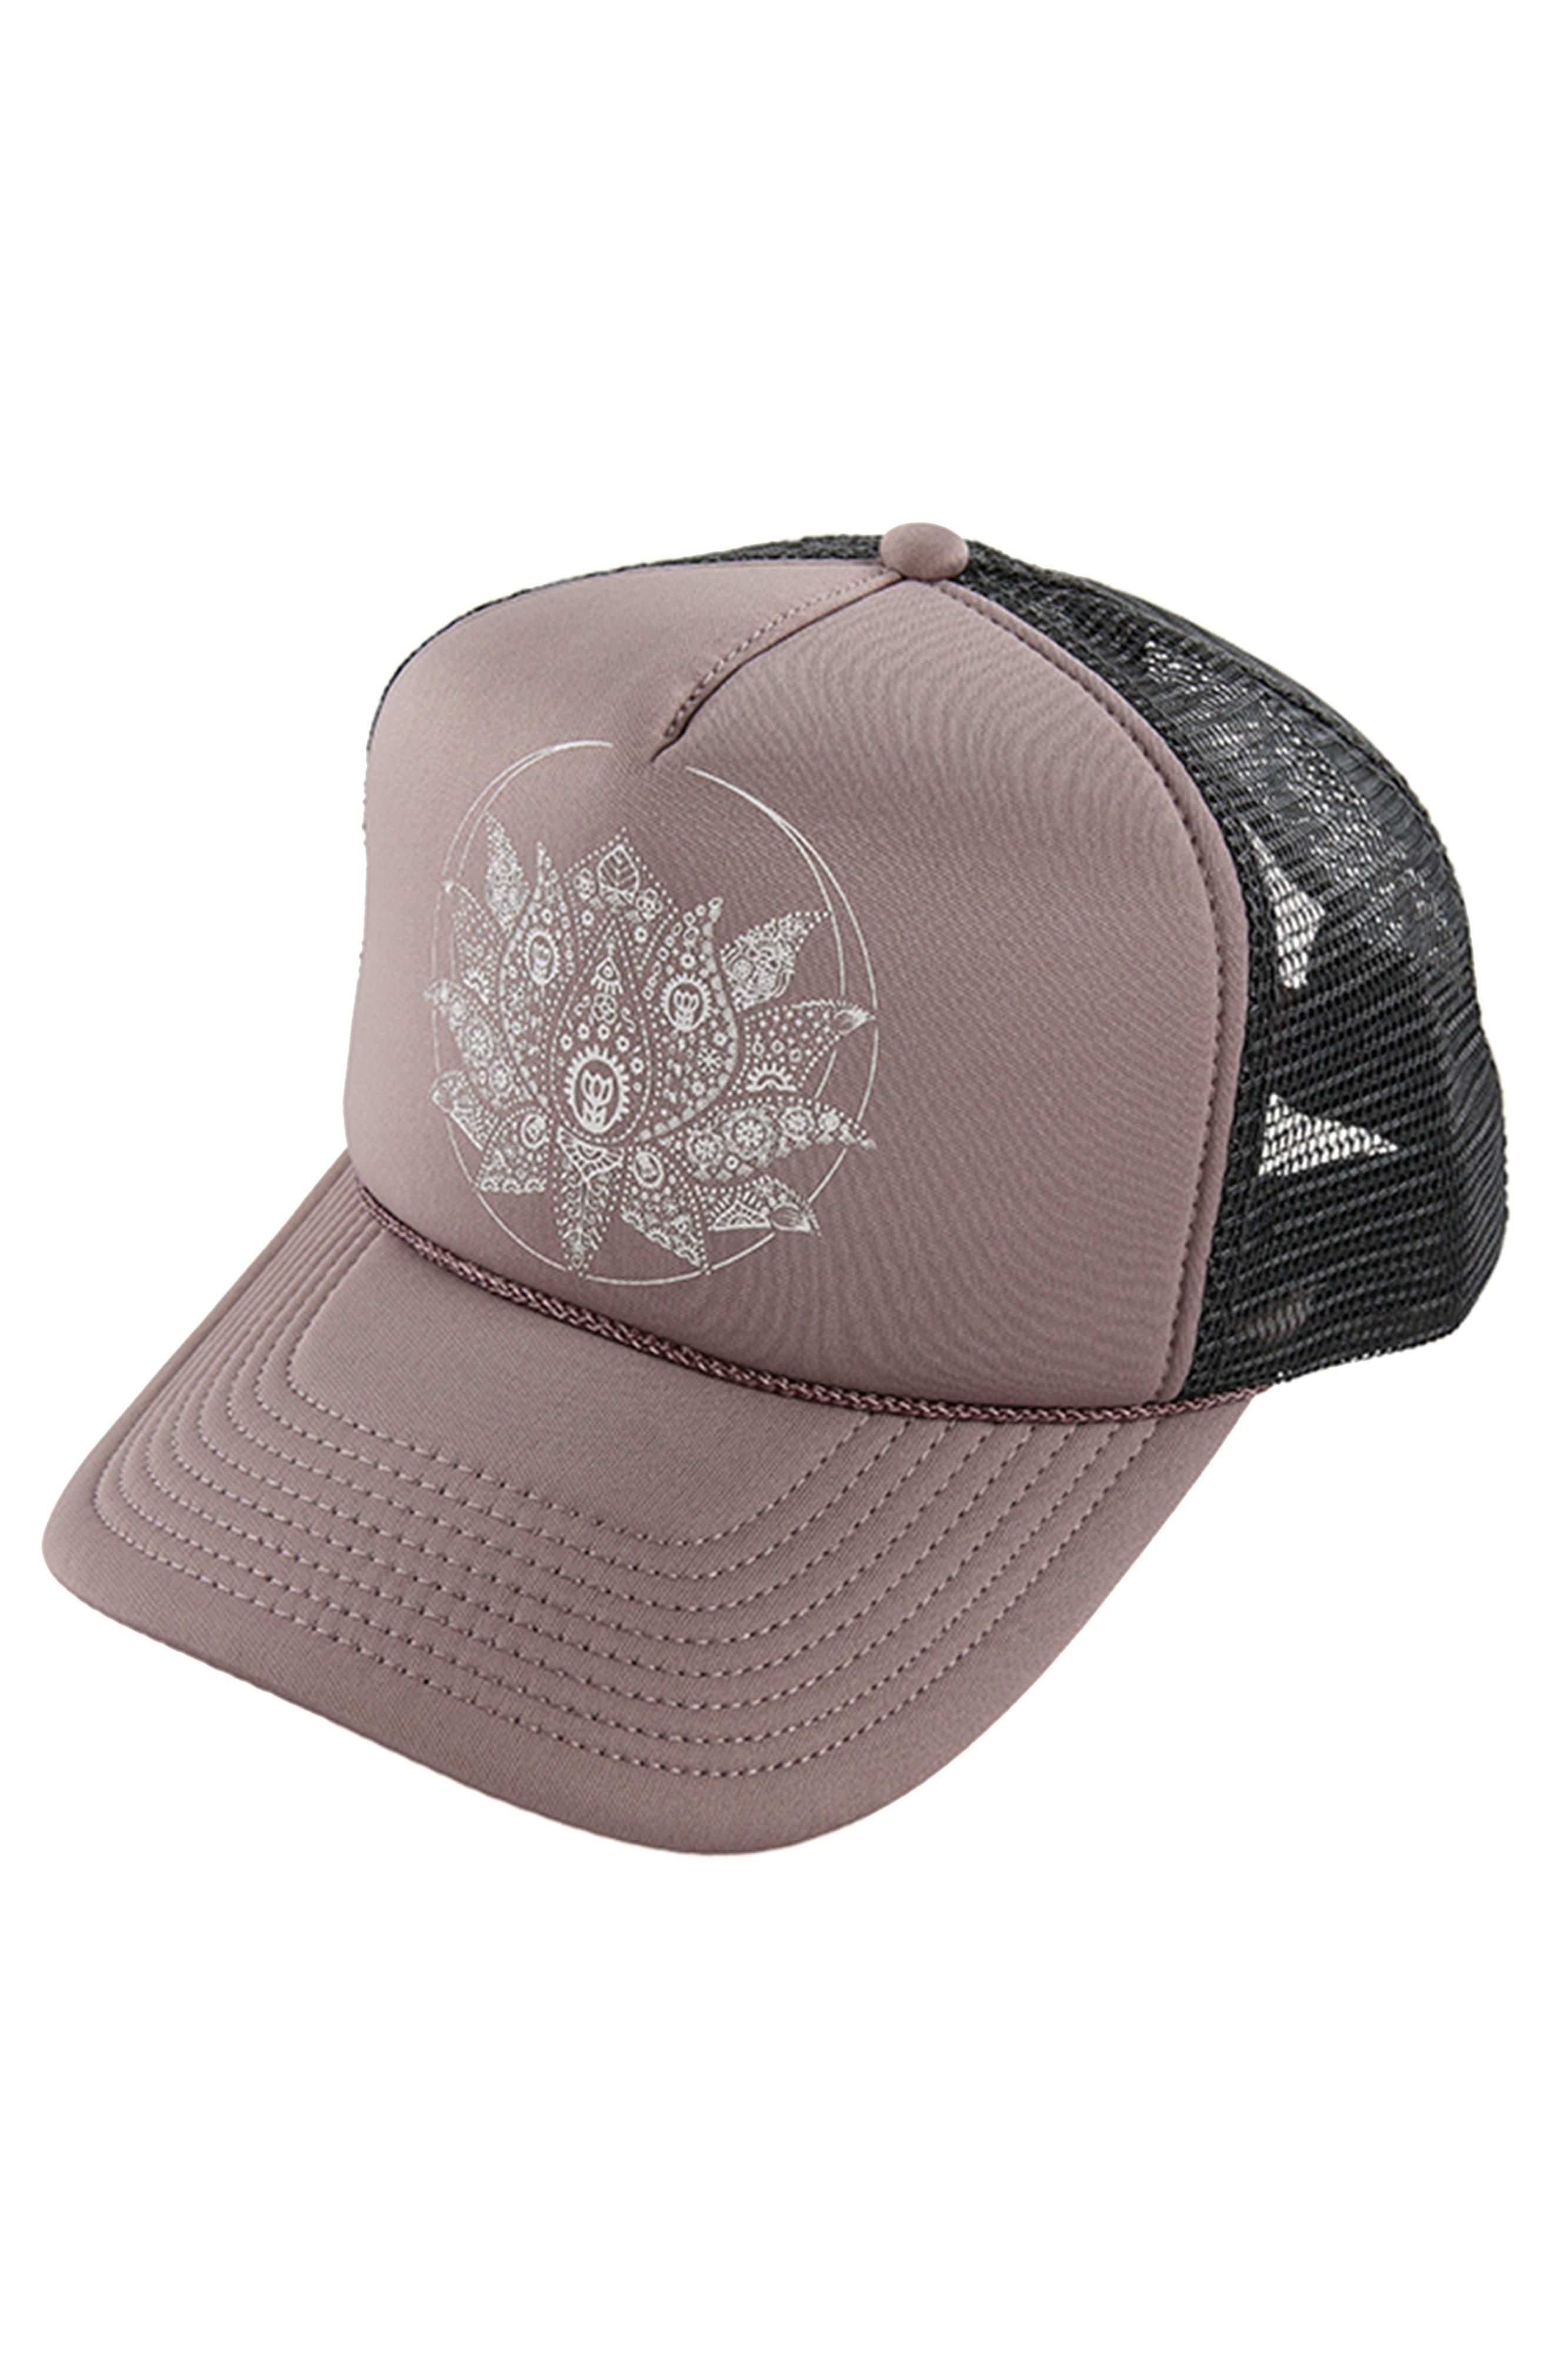 Zen Life Aloha Trucker Hat,                             Main thumbnail 1, color,                             509